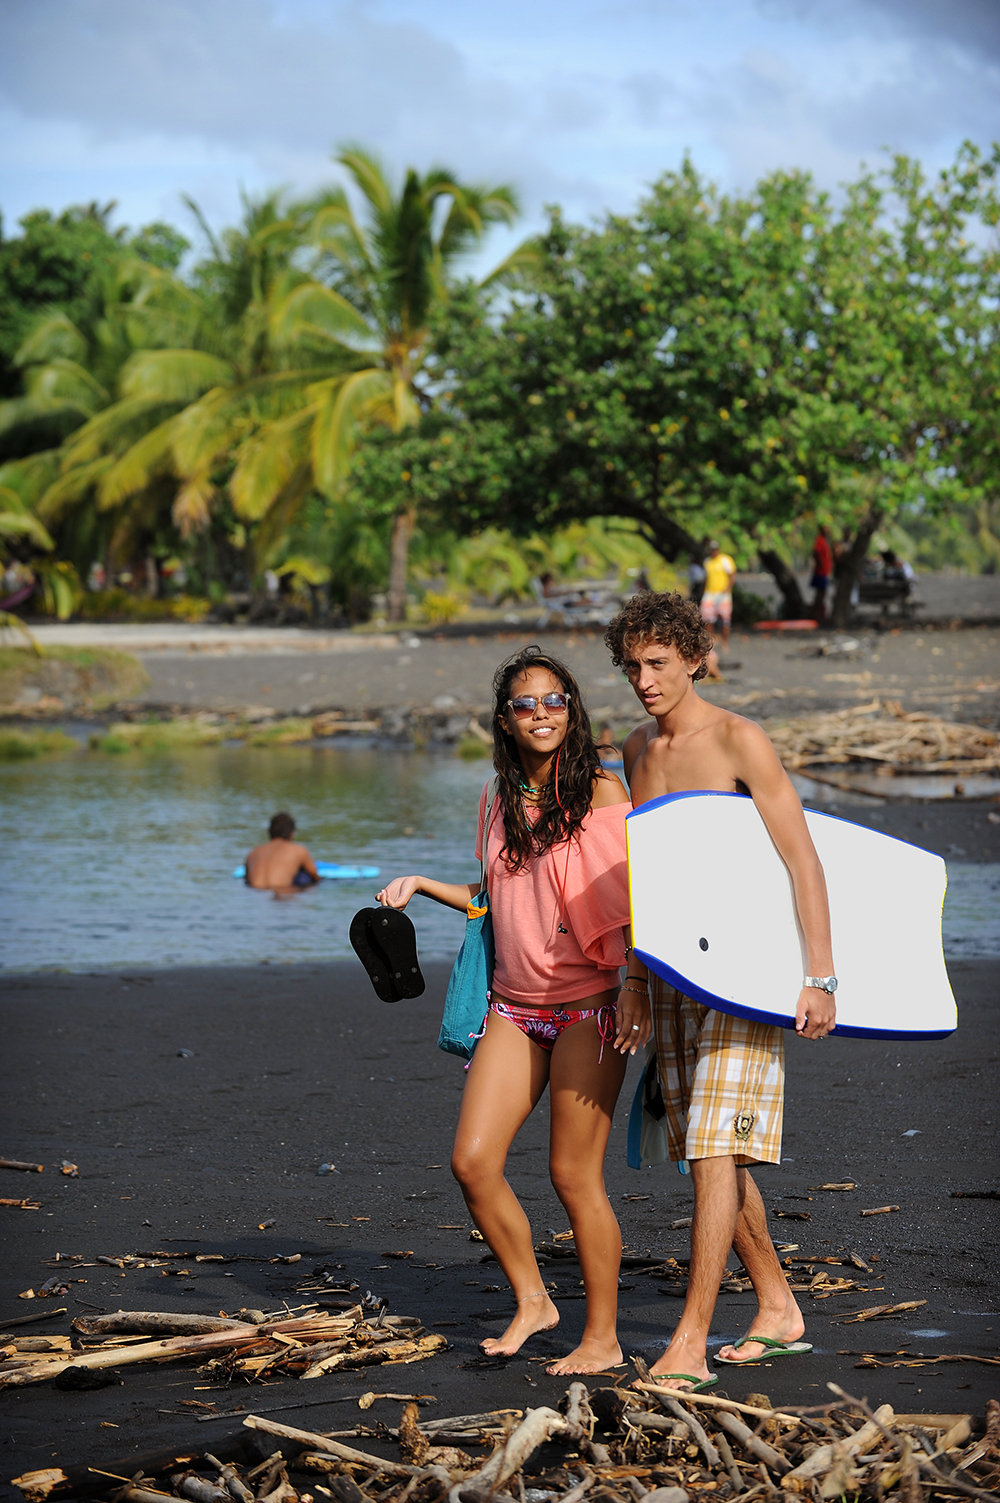 Tahiti, saari, Tyyni Valtameri, Matkablogi, ranta, matka